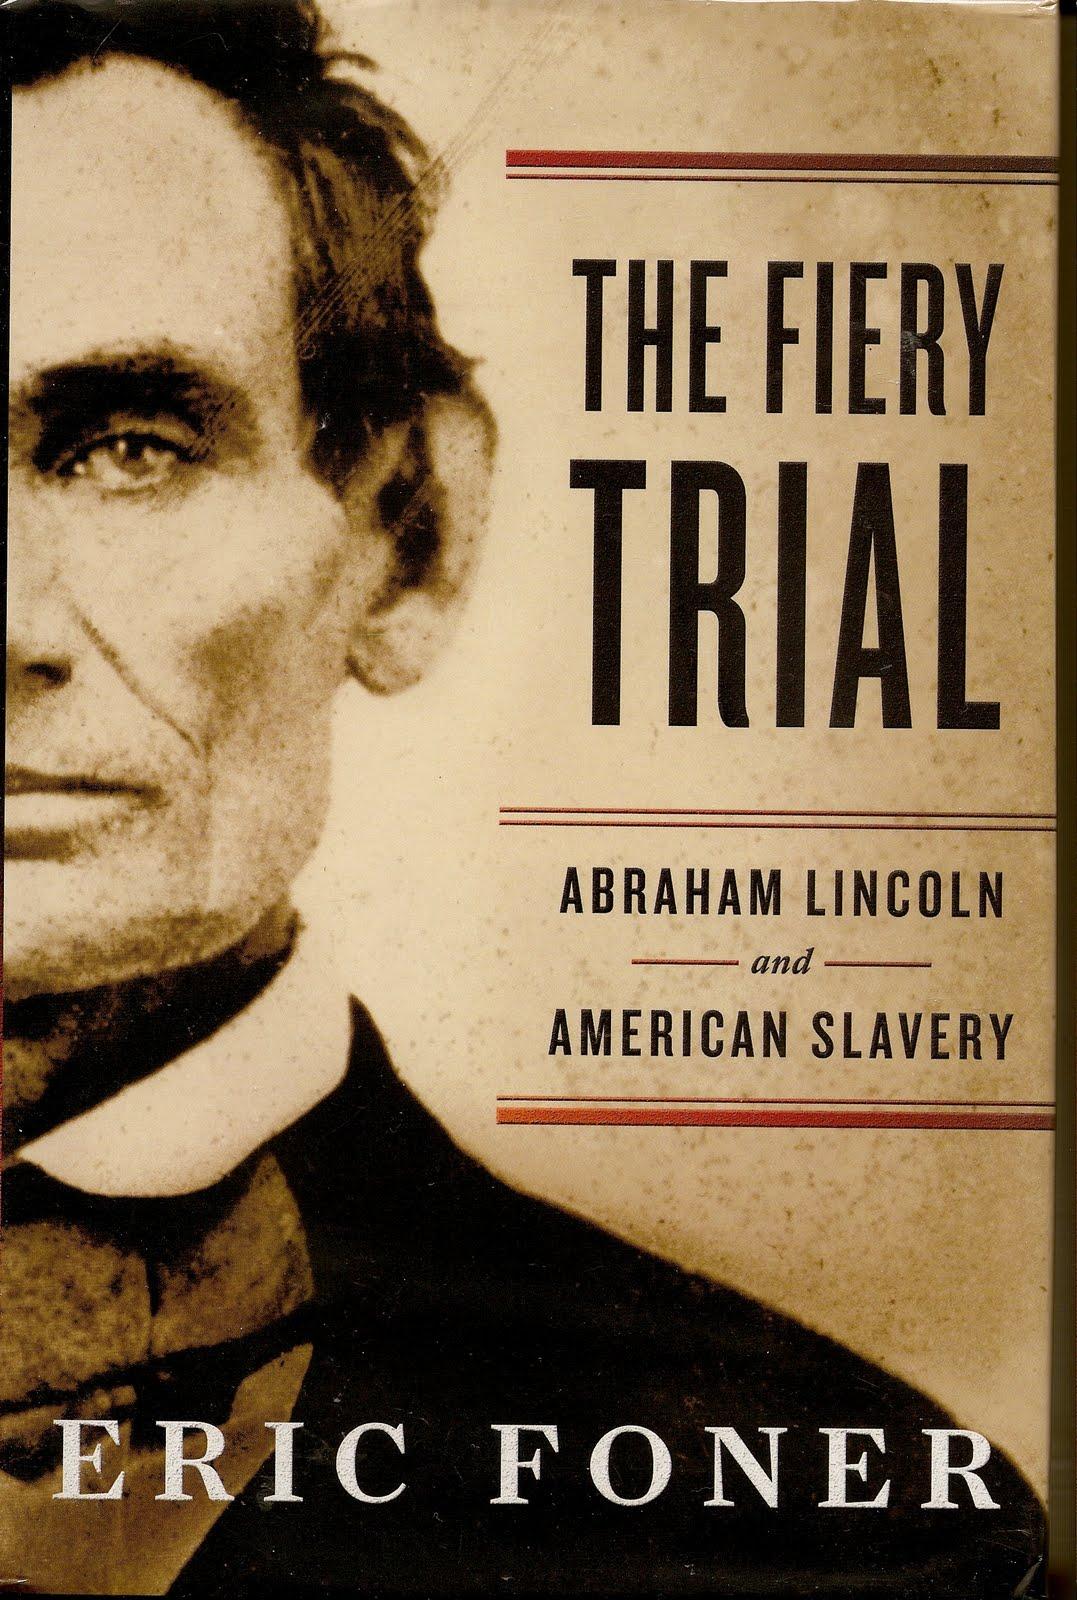 http://1.bp.blogspot.com/_DBRC1JjTZgA/TLIDrjL2FfI/AAAAAAAABwM/sXkyeBAM4FY/s1600/Rooftop+Lincoln+Fiery+Trial.jpg